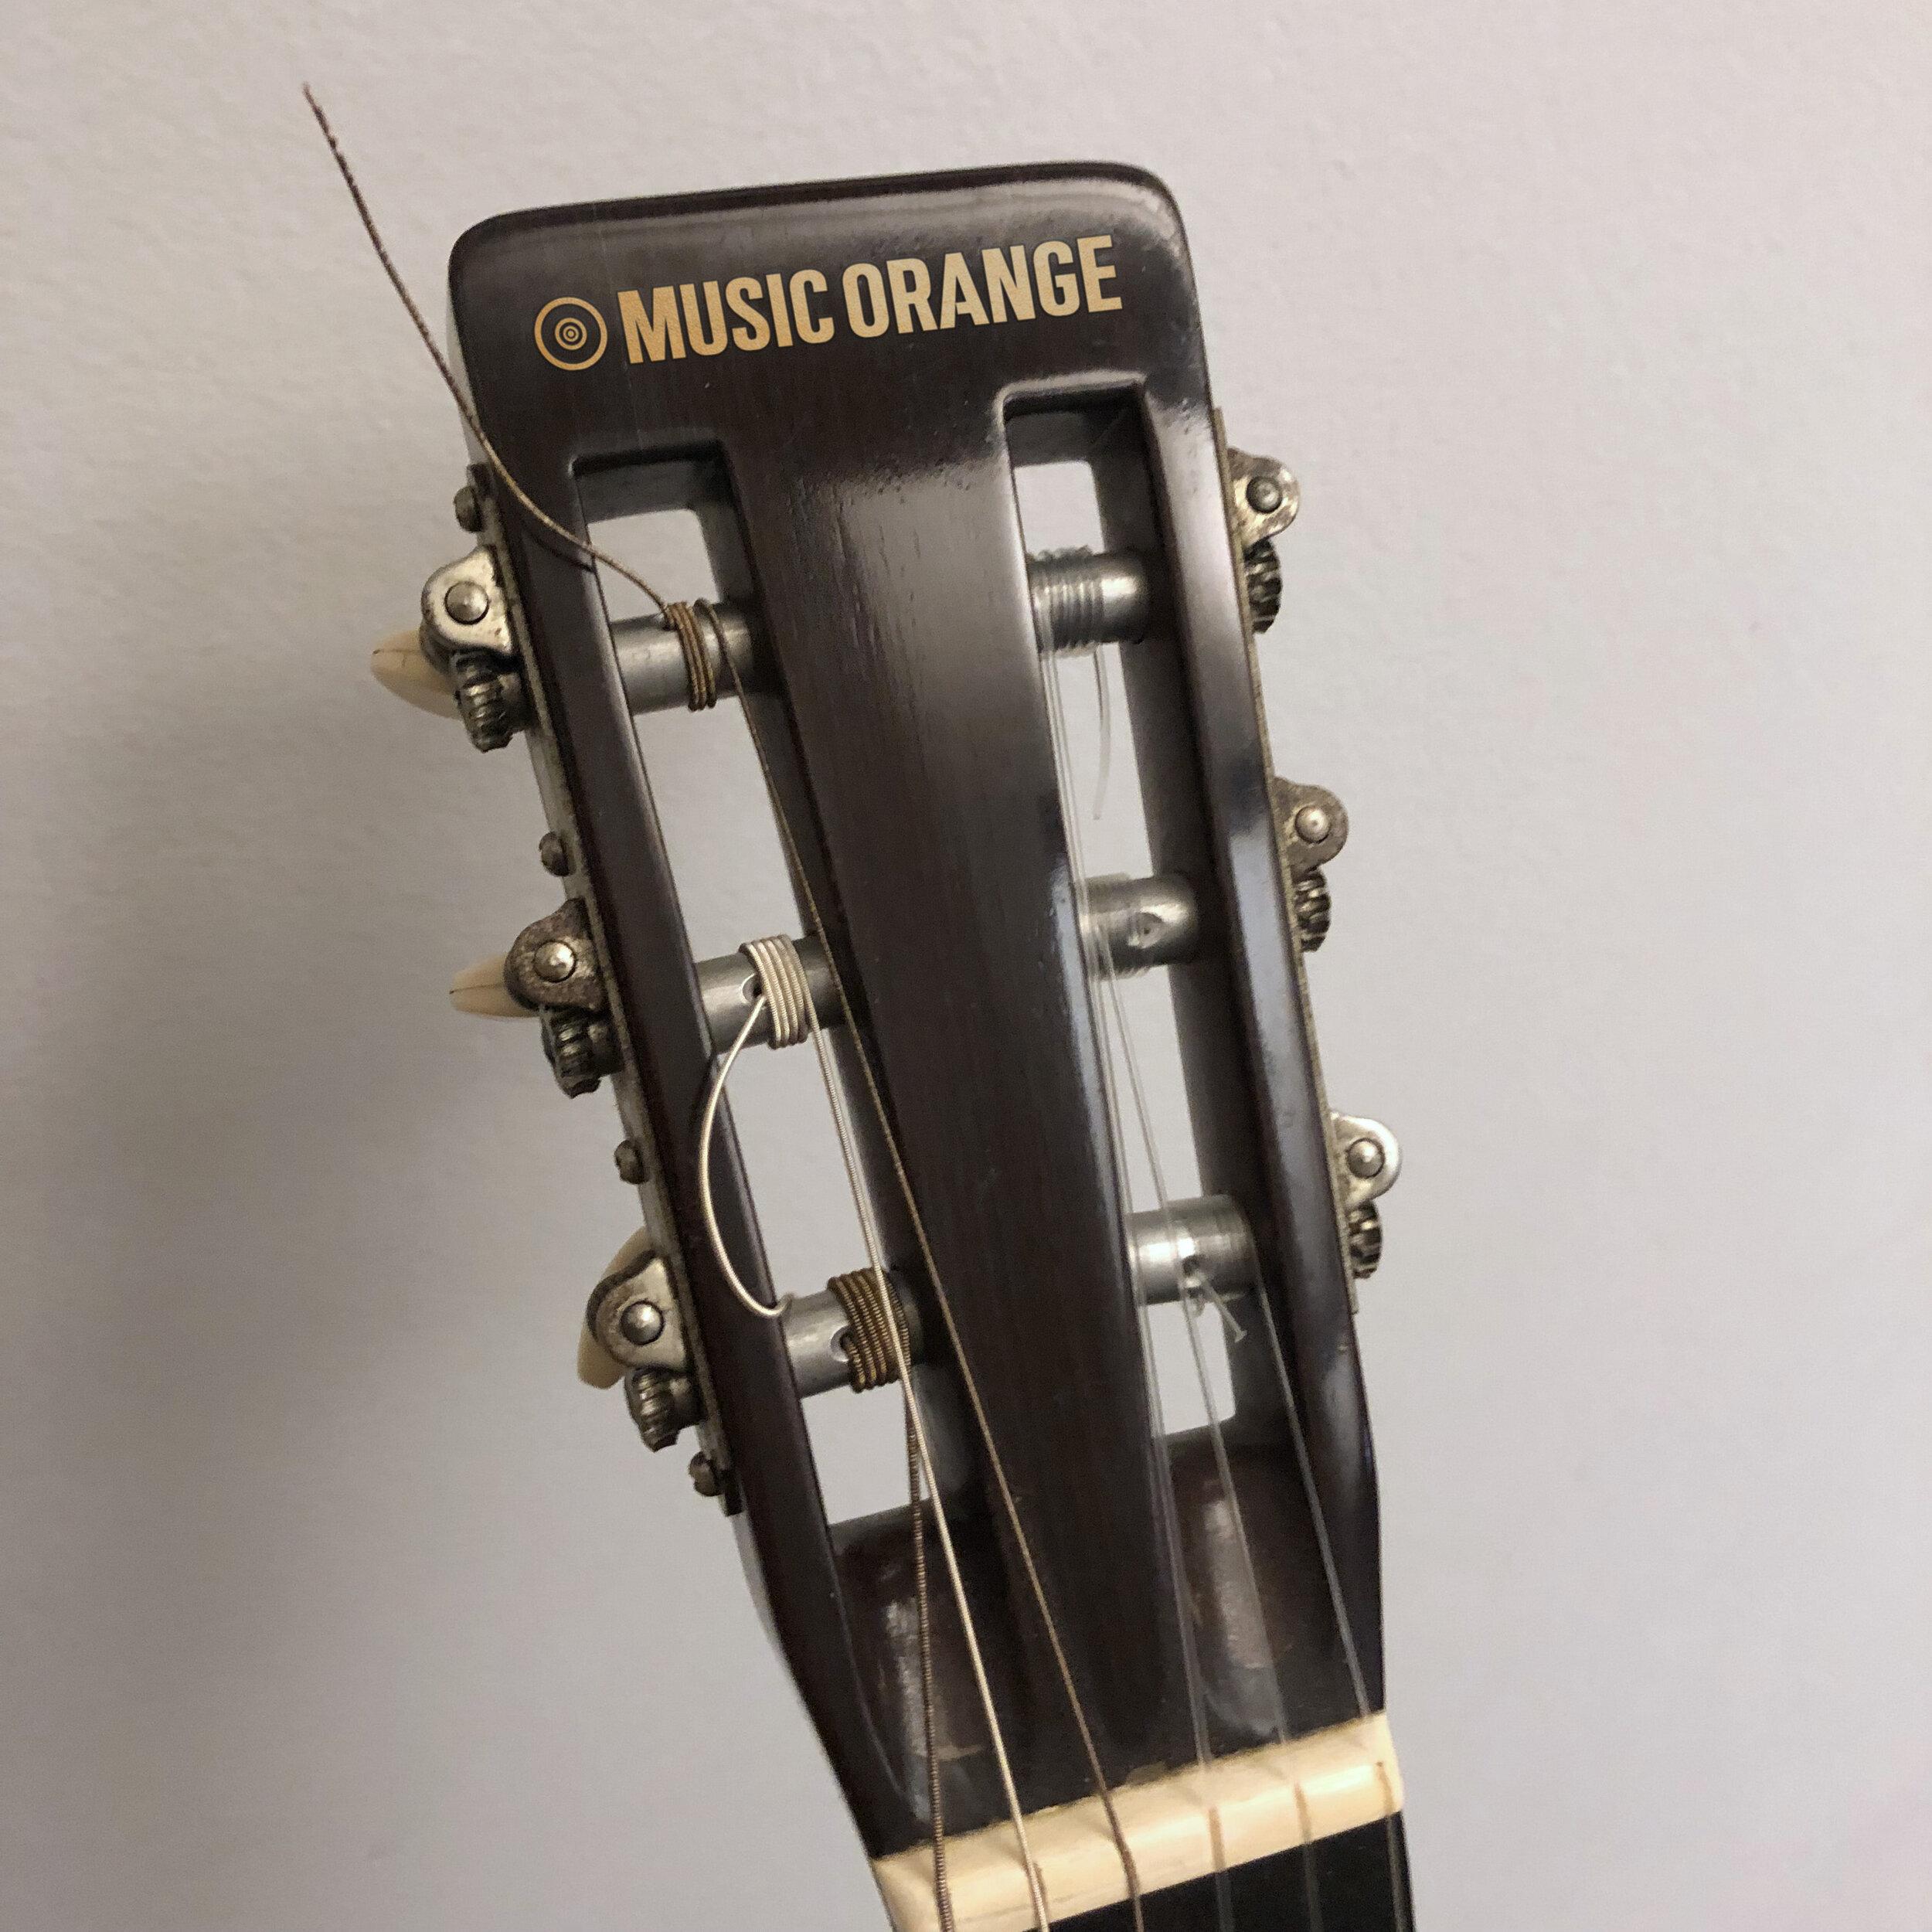 music-orange-guitar-headstock.jpg